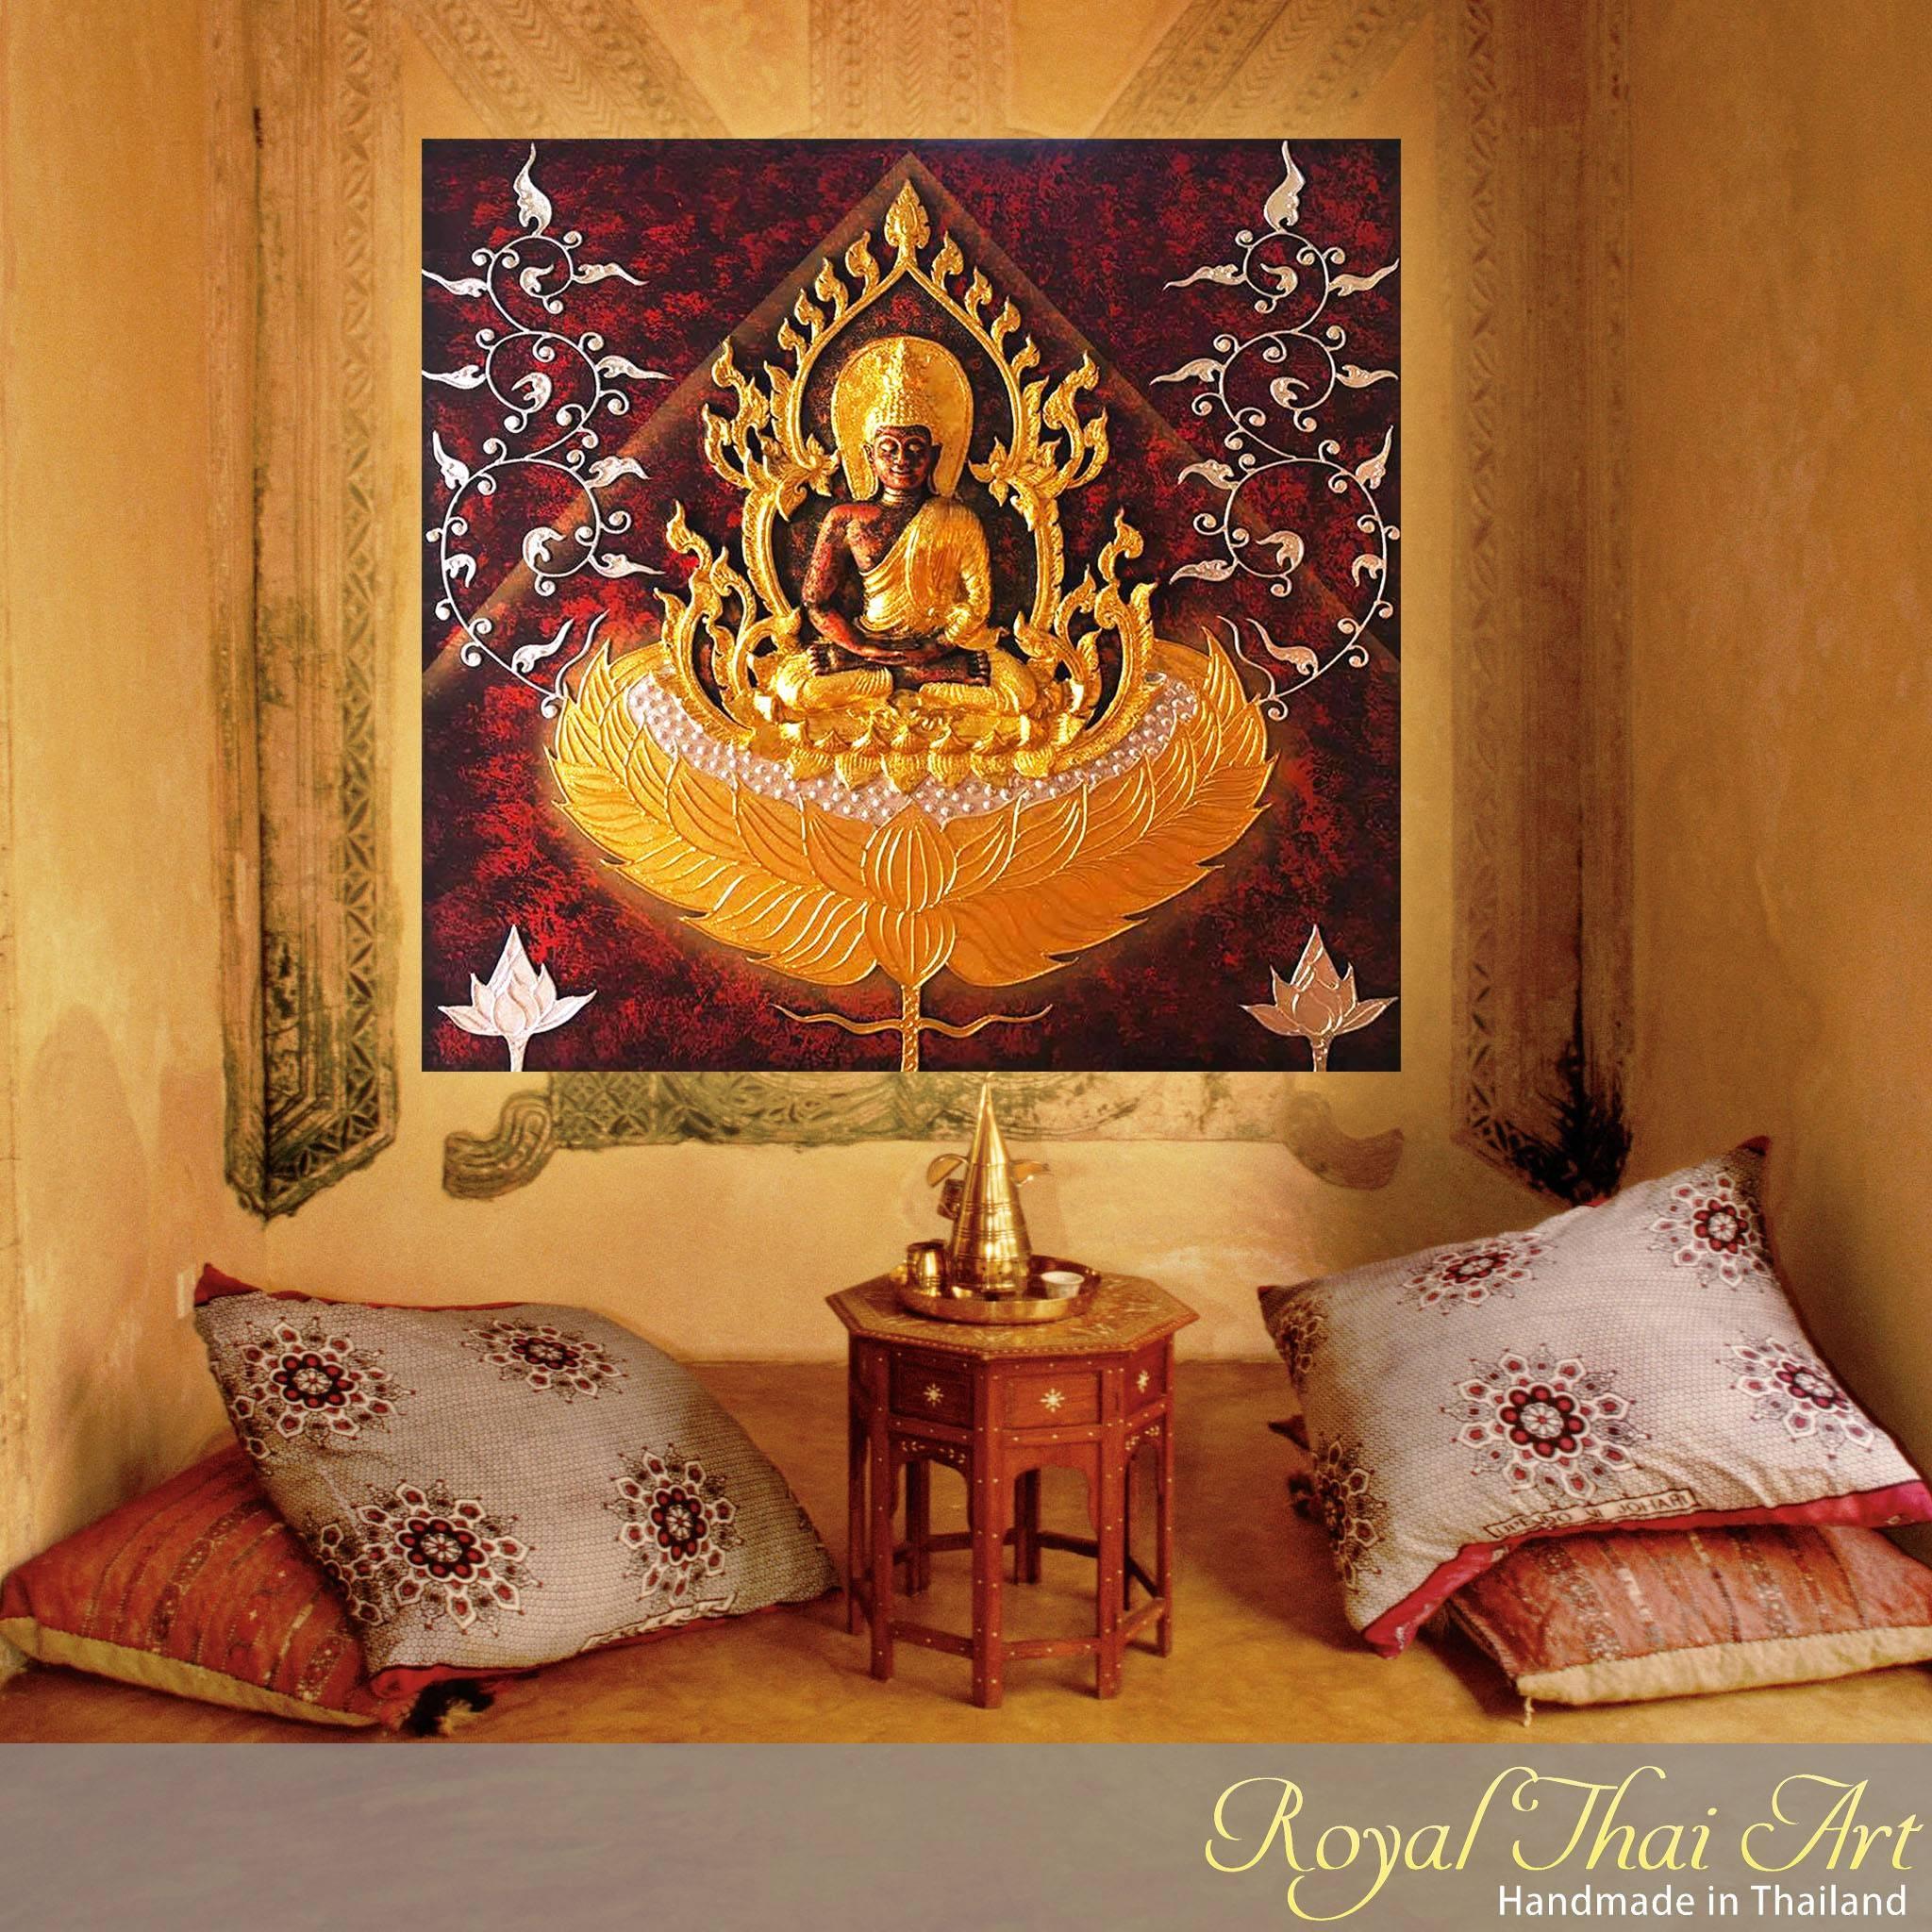 Buddha Painting 3D Handmade Gold Statue | Royal Thai Art Regarding Most Current 3D Buddha Wall Art (View 7 of 20)